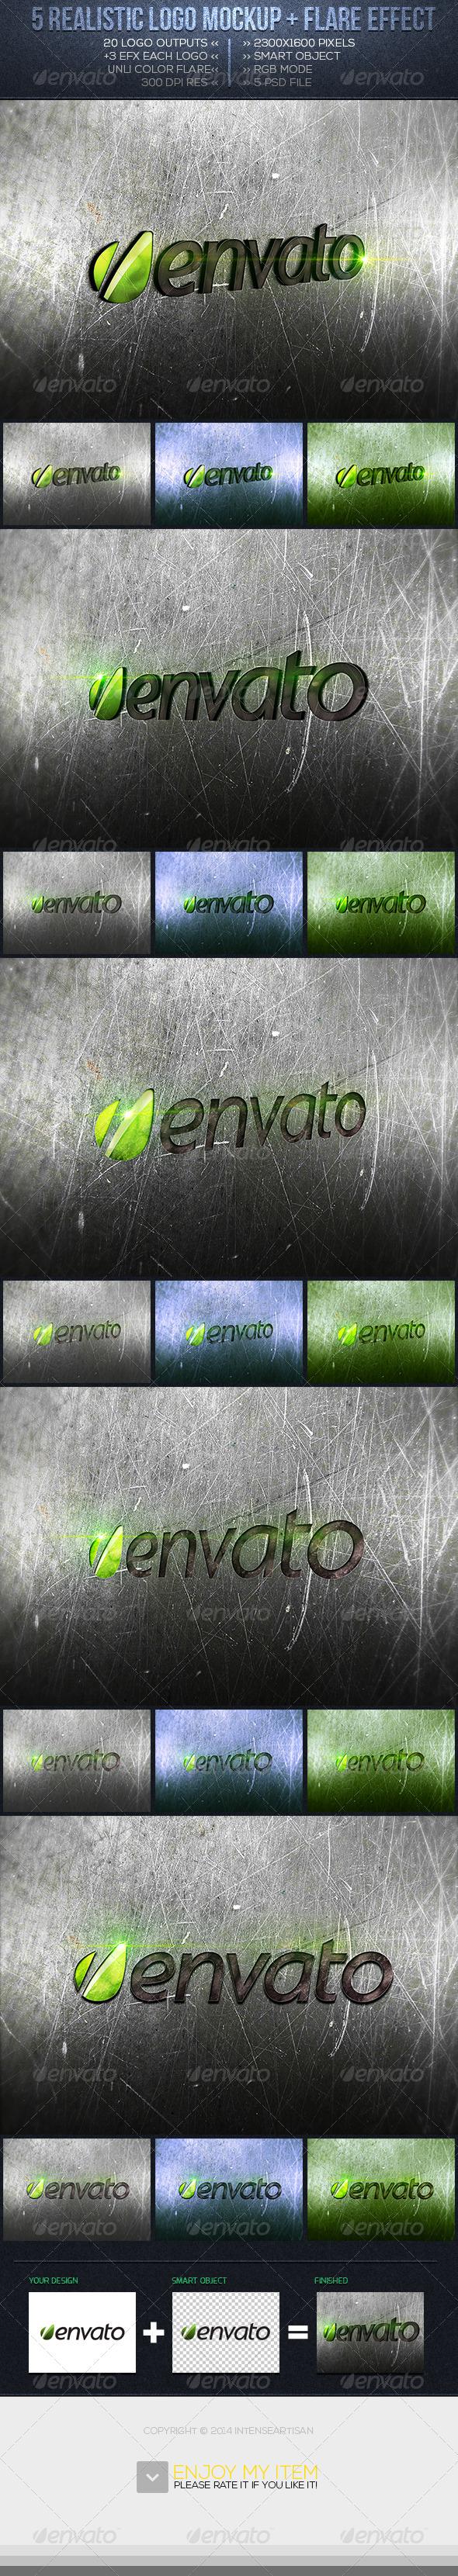 Realistic Logo Mockup Vol.2 - Logo Product Mock-Ups